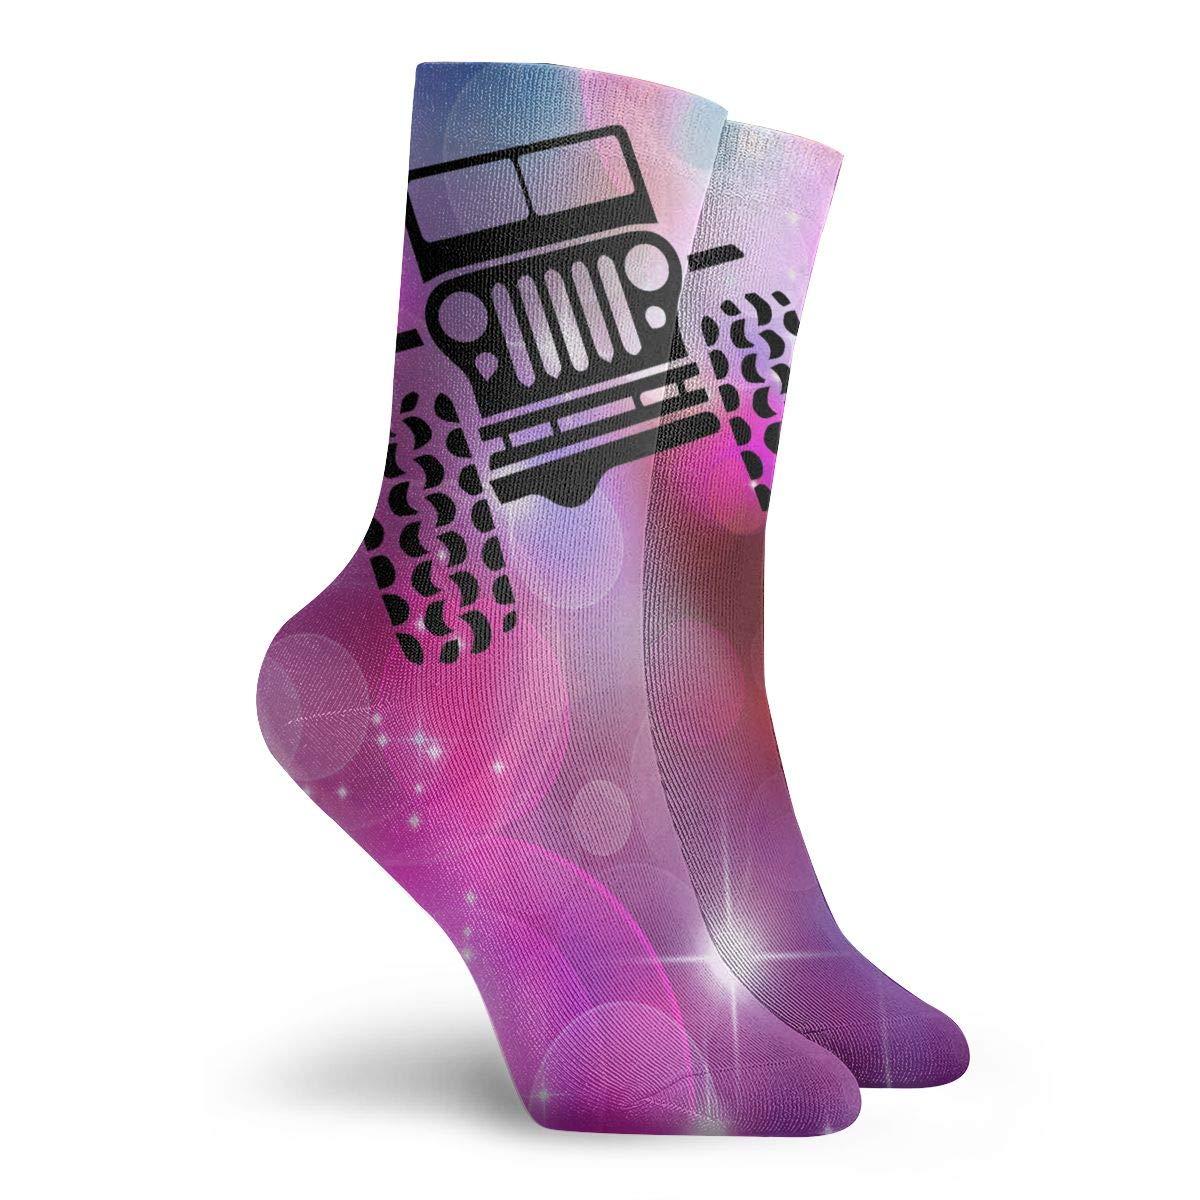 Driver Got Mud Jeep Car Unisex Holiday Sock 30cm Long Sock